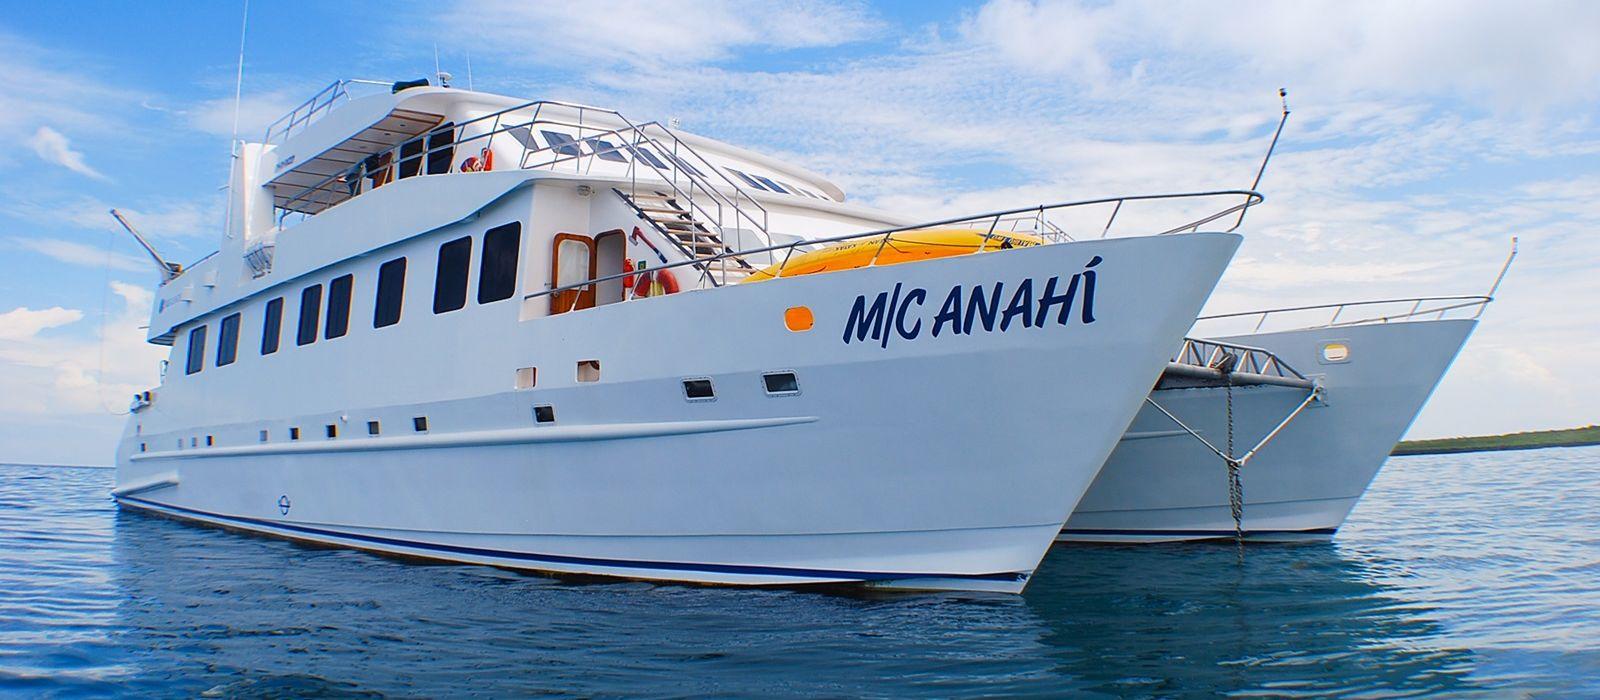 Hotel Yacht Anahi Ecuador/Galapagos